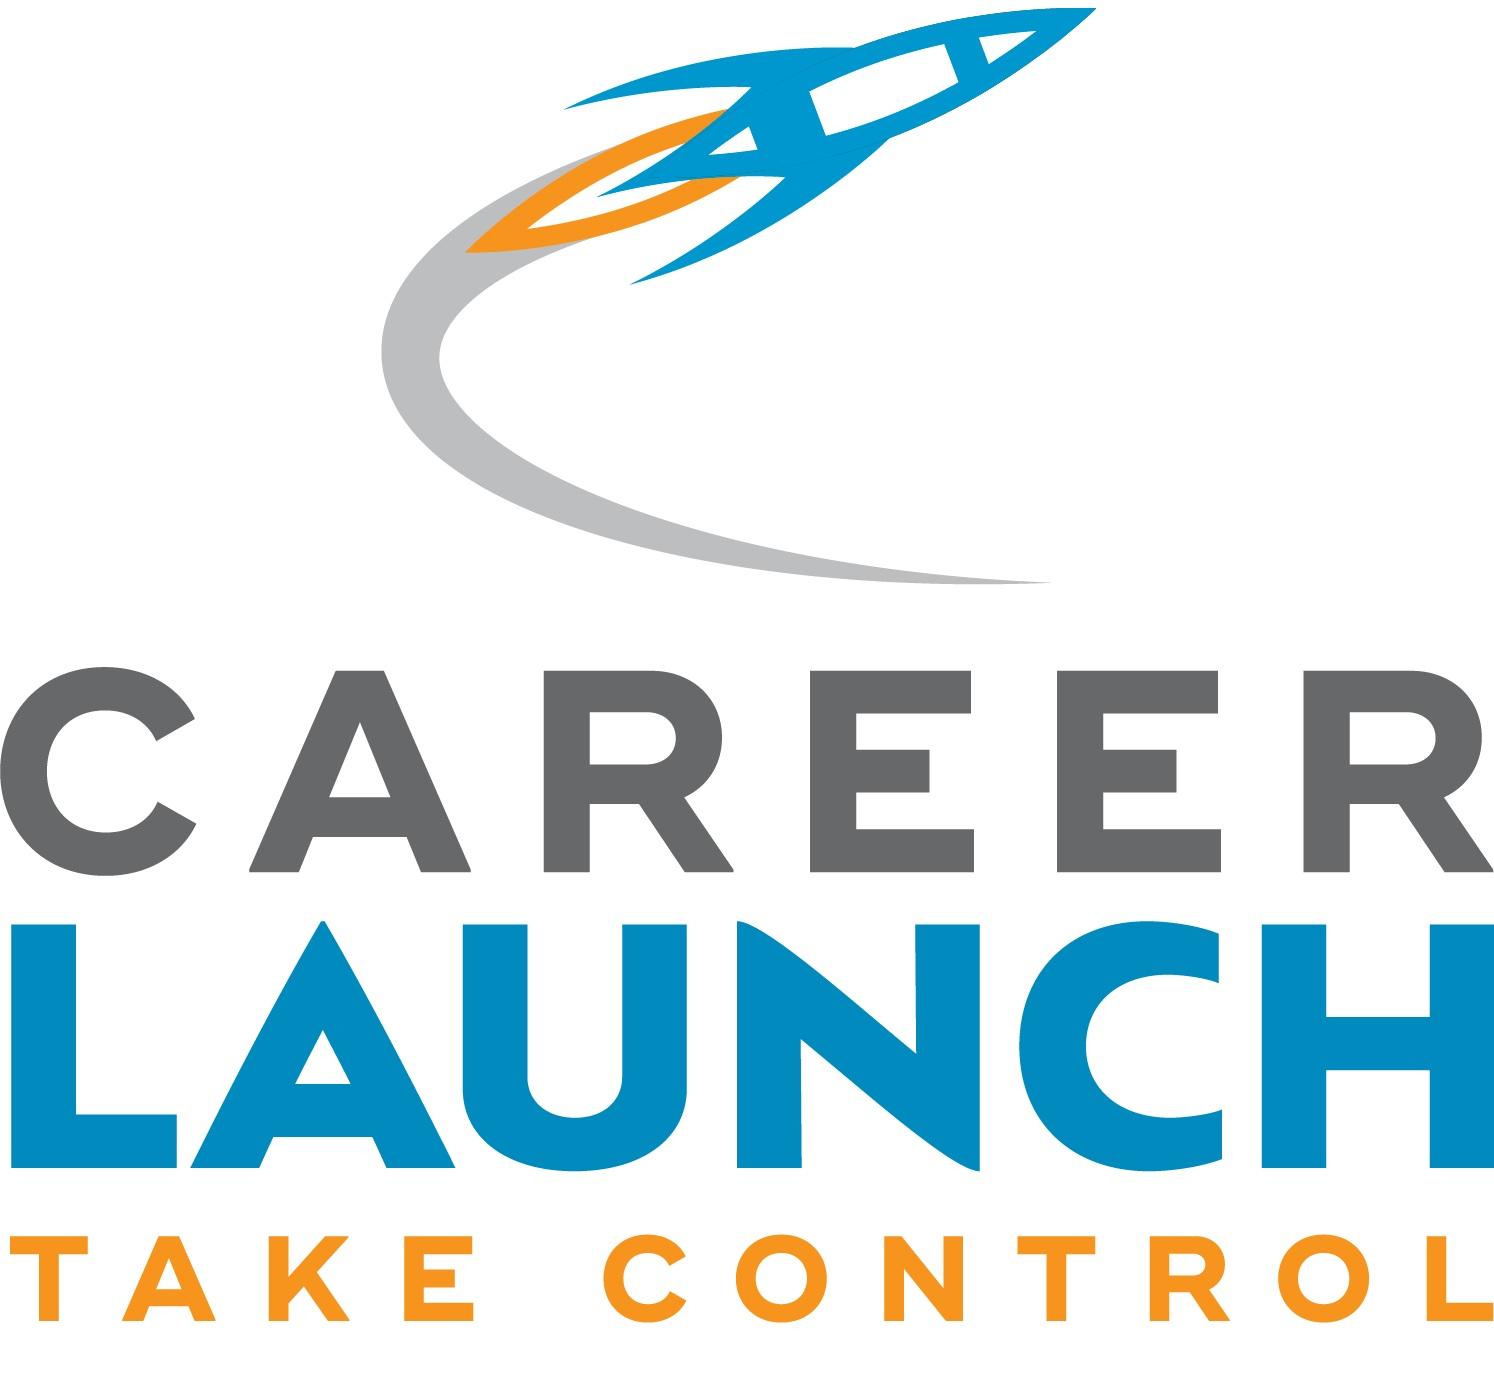 CareerLaunch_logo.jpg